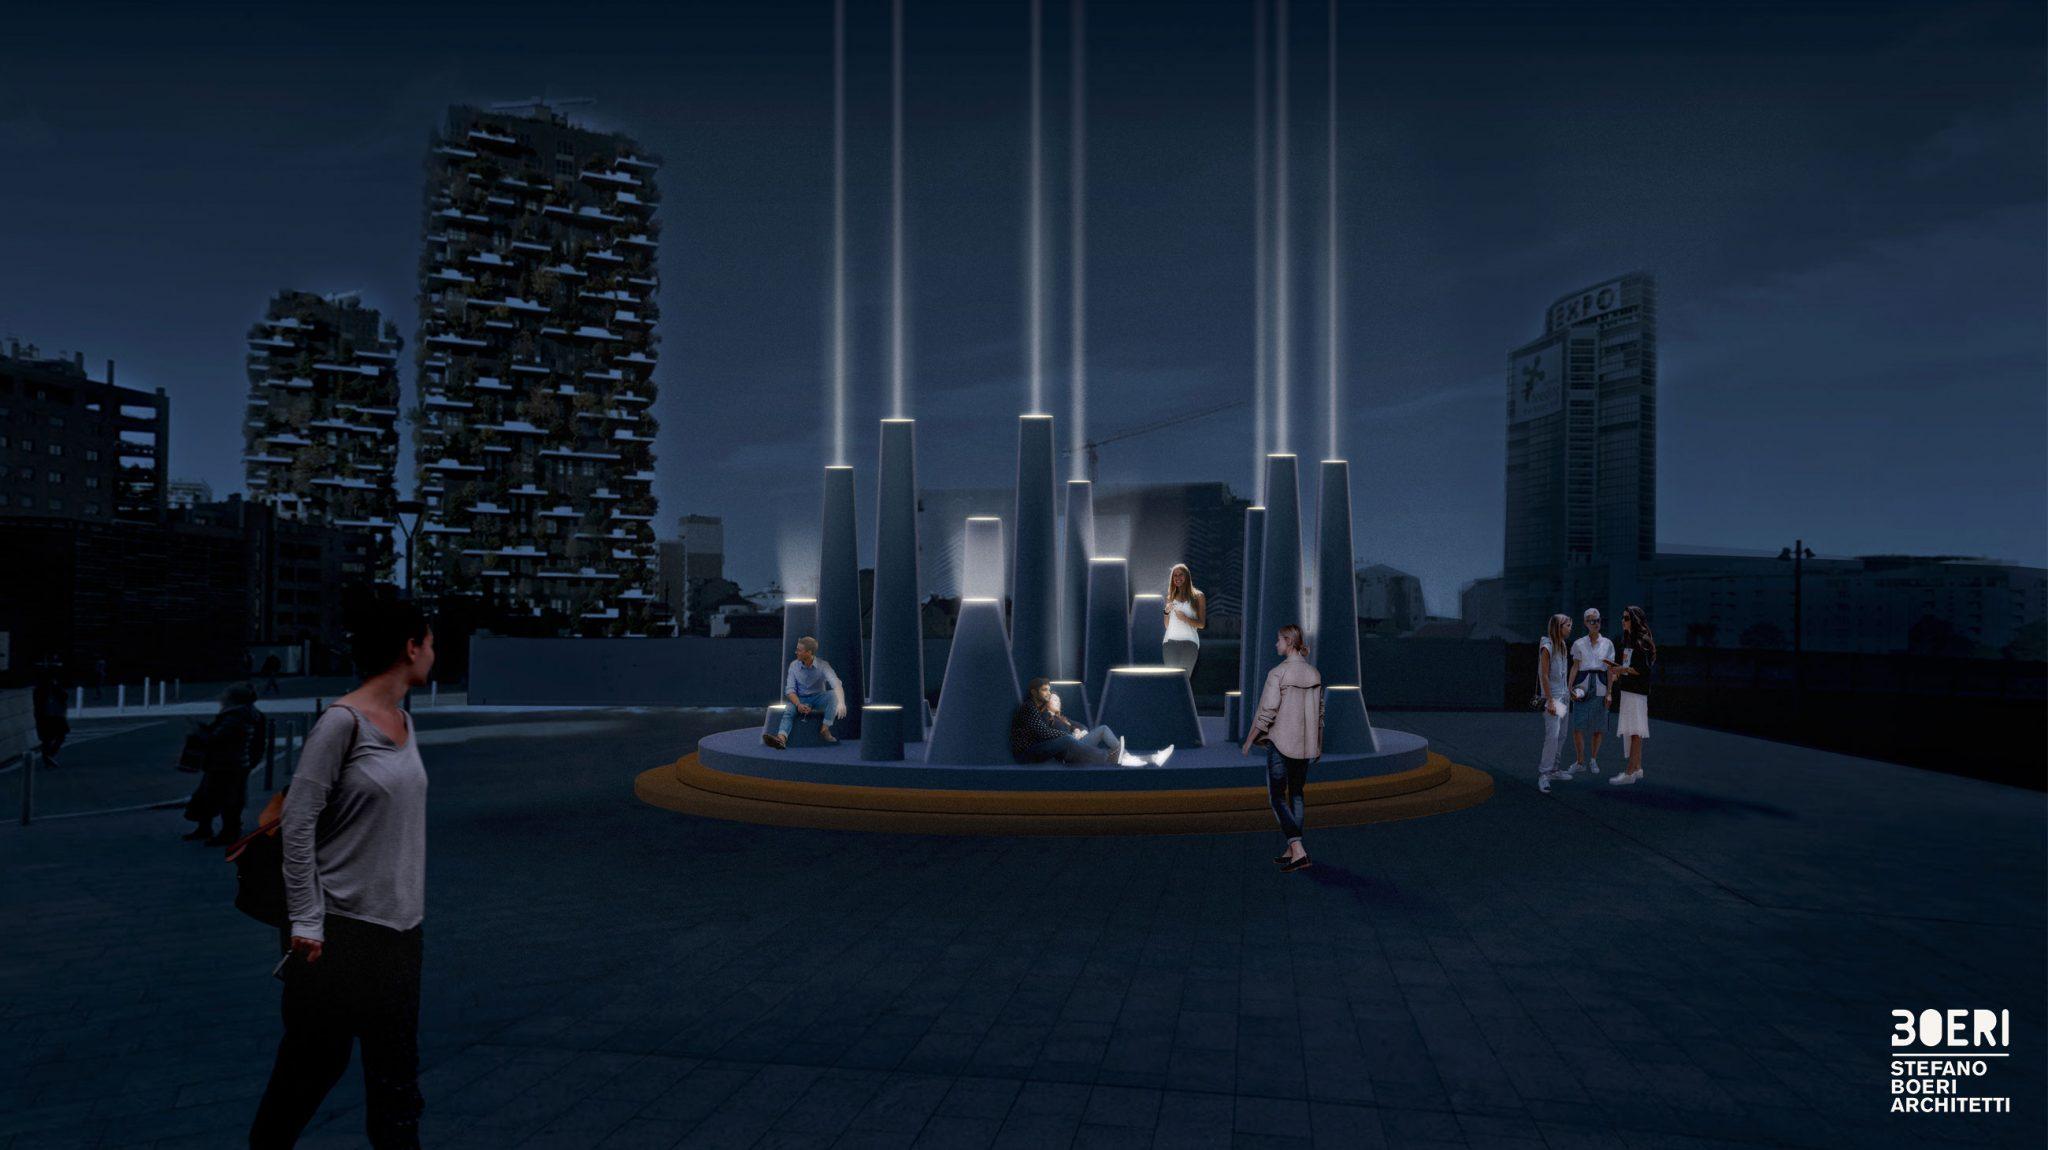 Lighthenge_Edison_Stefano-Boeri-Architetti